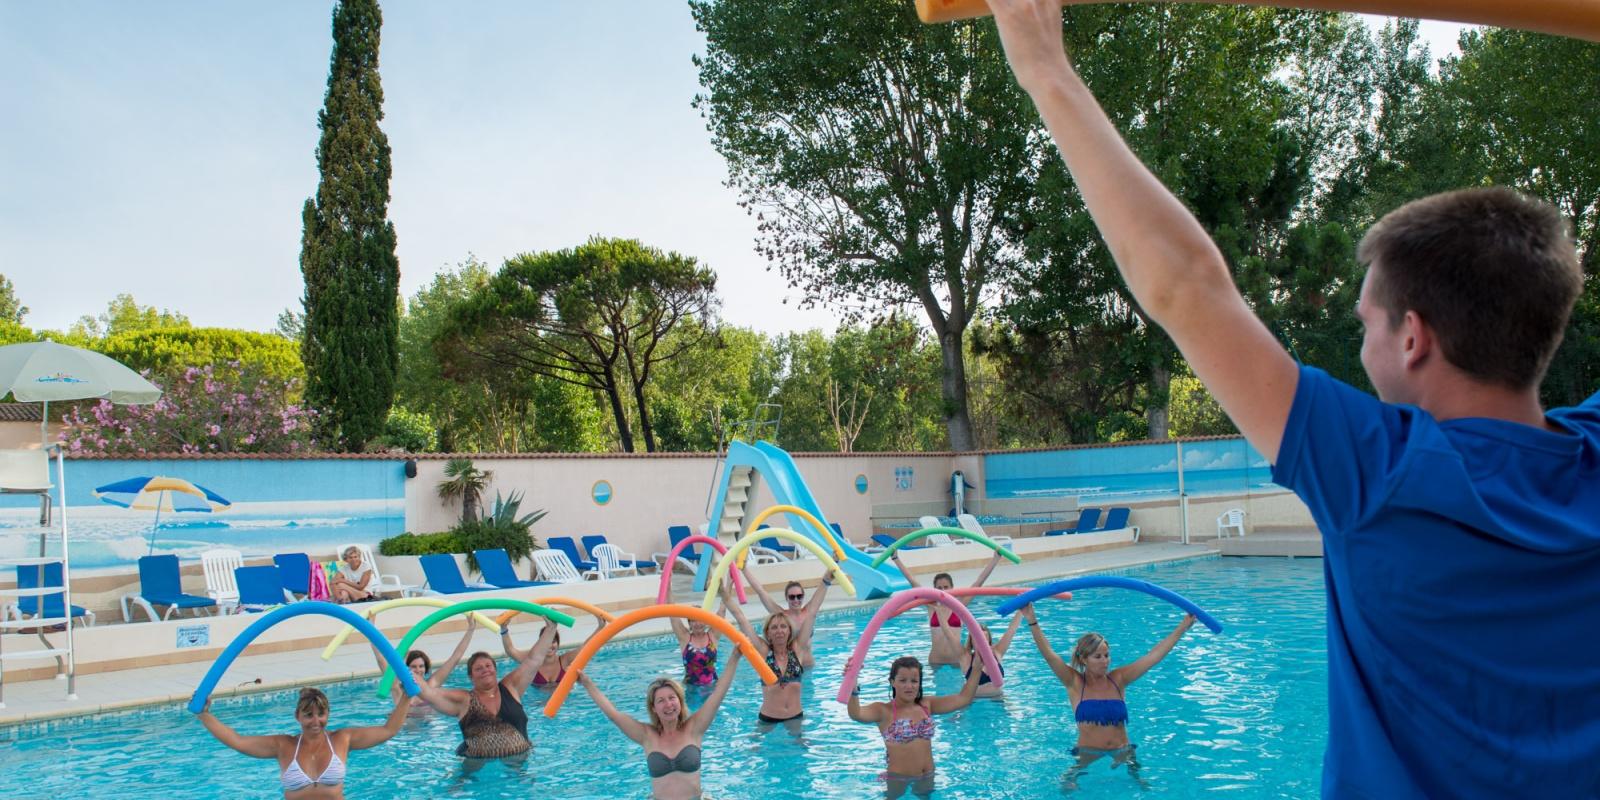 Camping familial camargue vos vacances pleines d 39 animations for Petit camping familial avec piscine